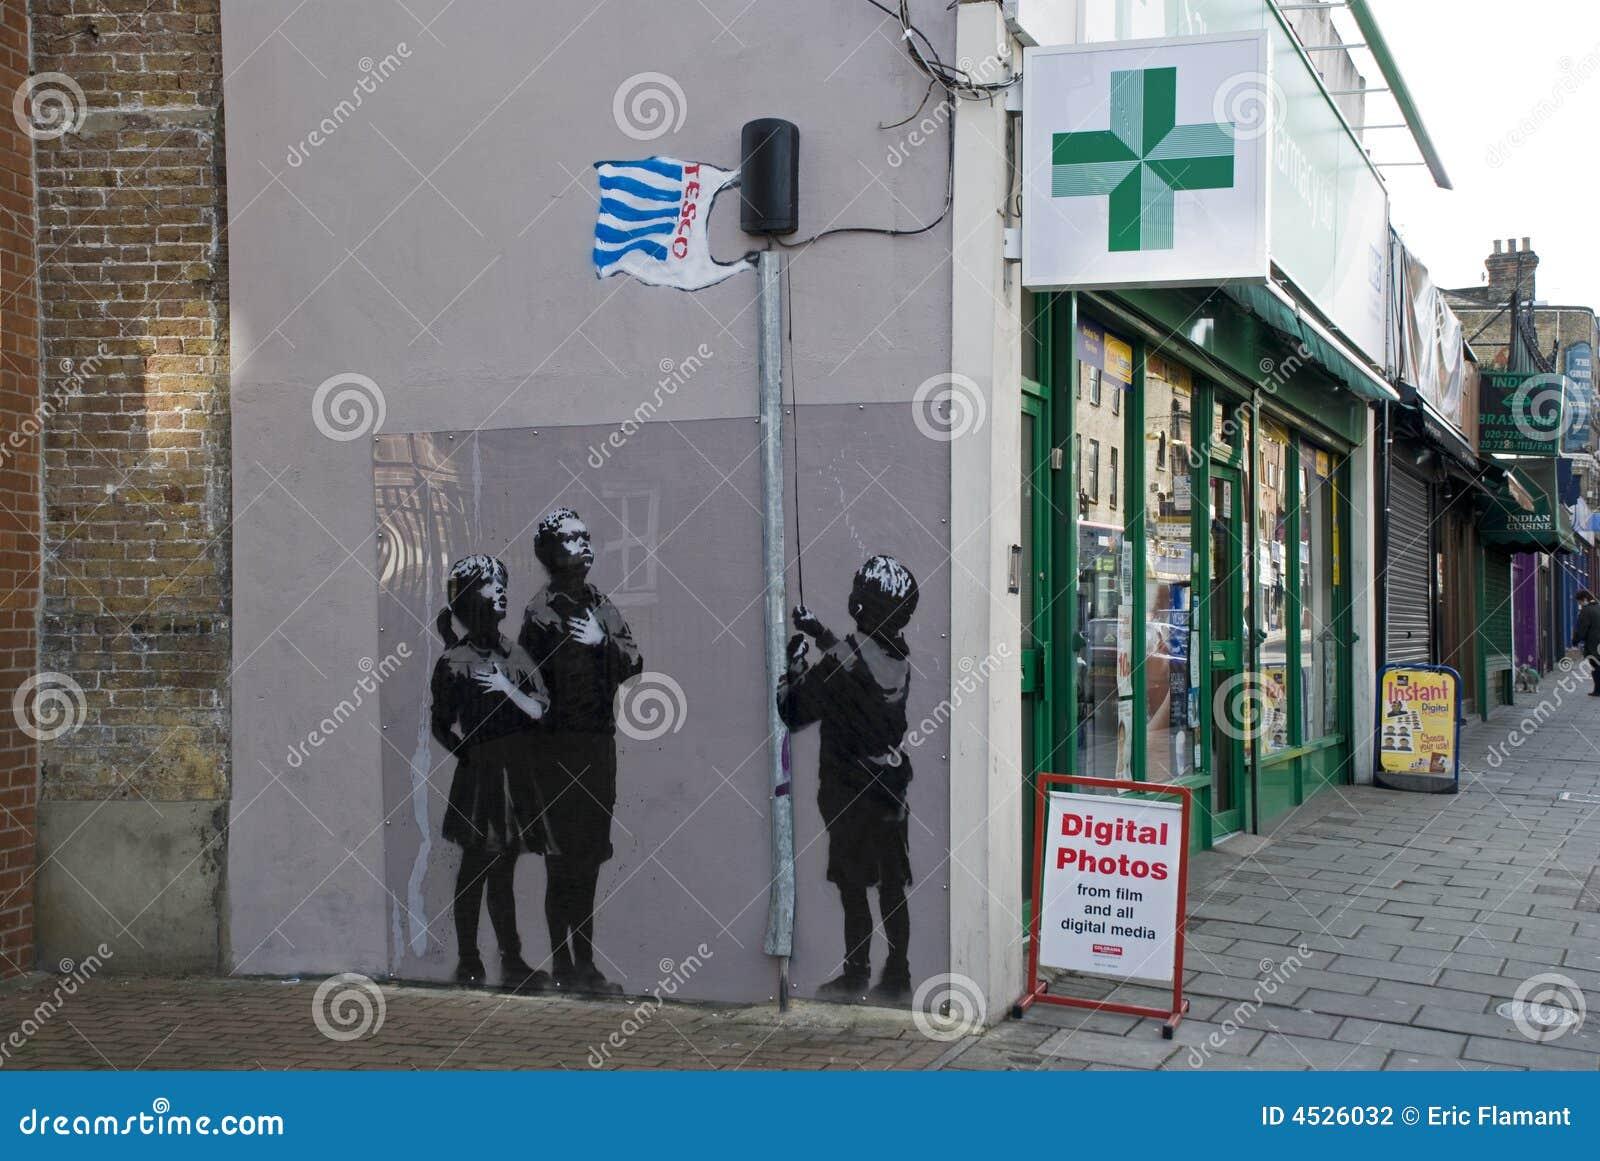 Dessin-modèle neuf de Banksy